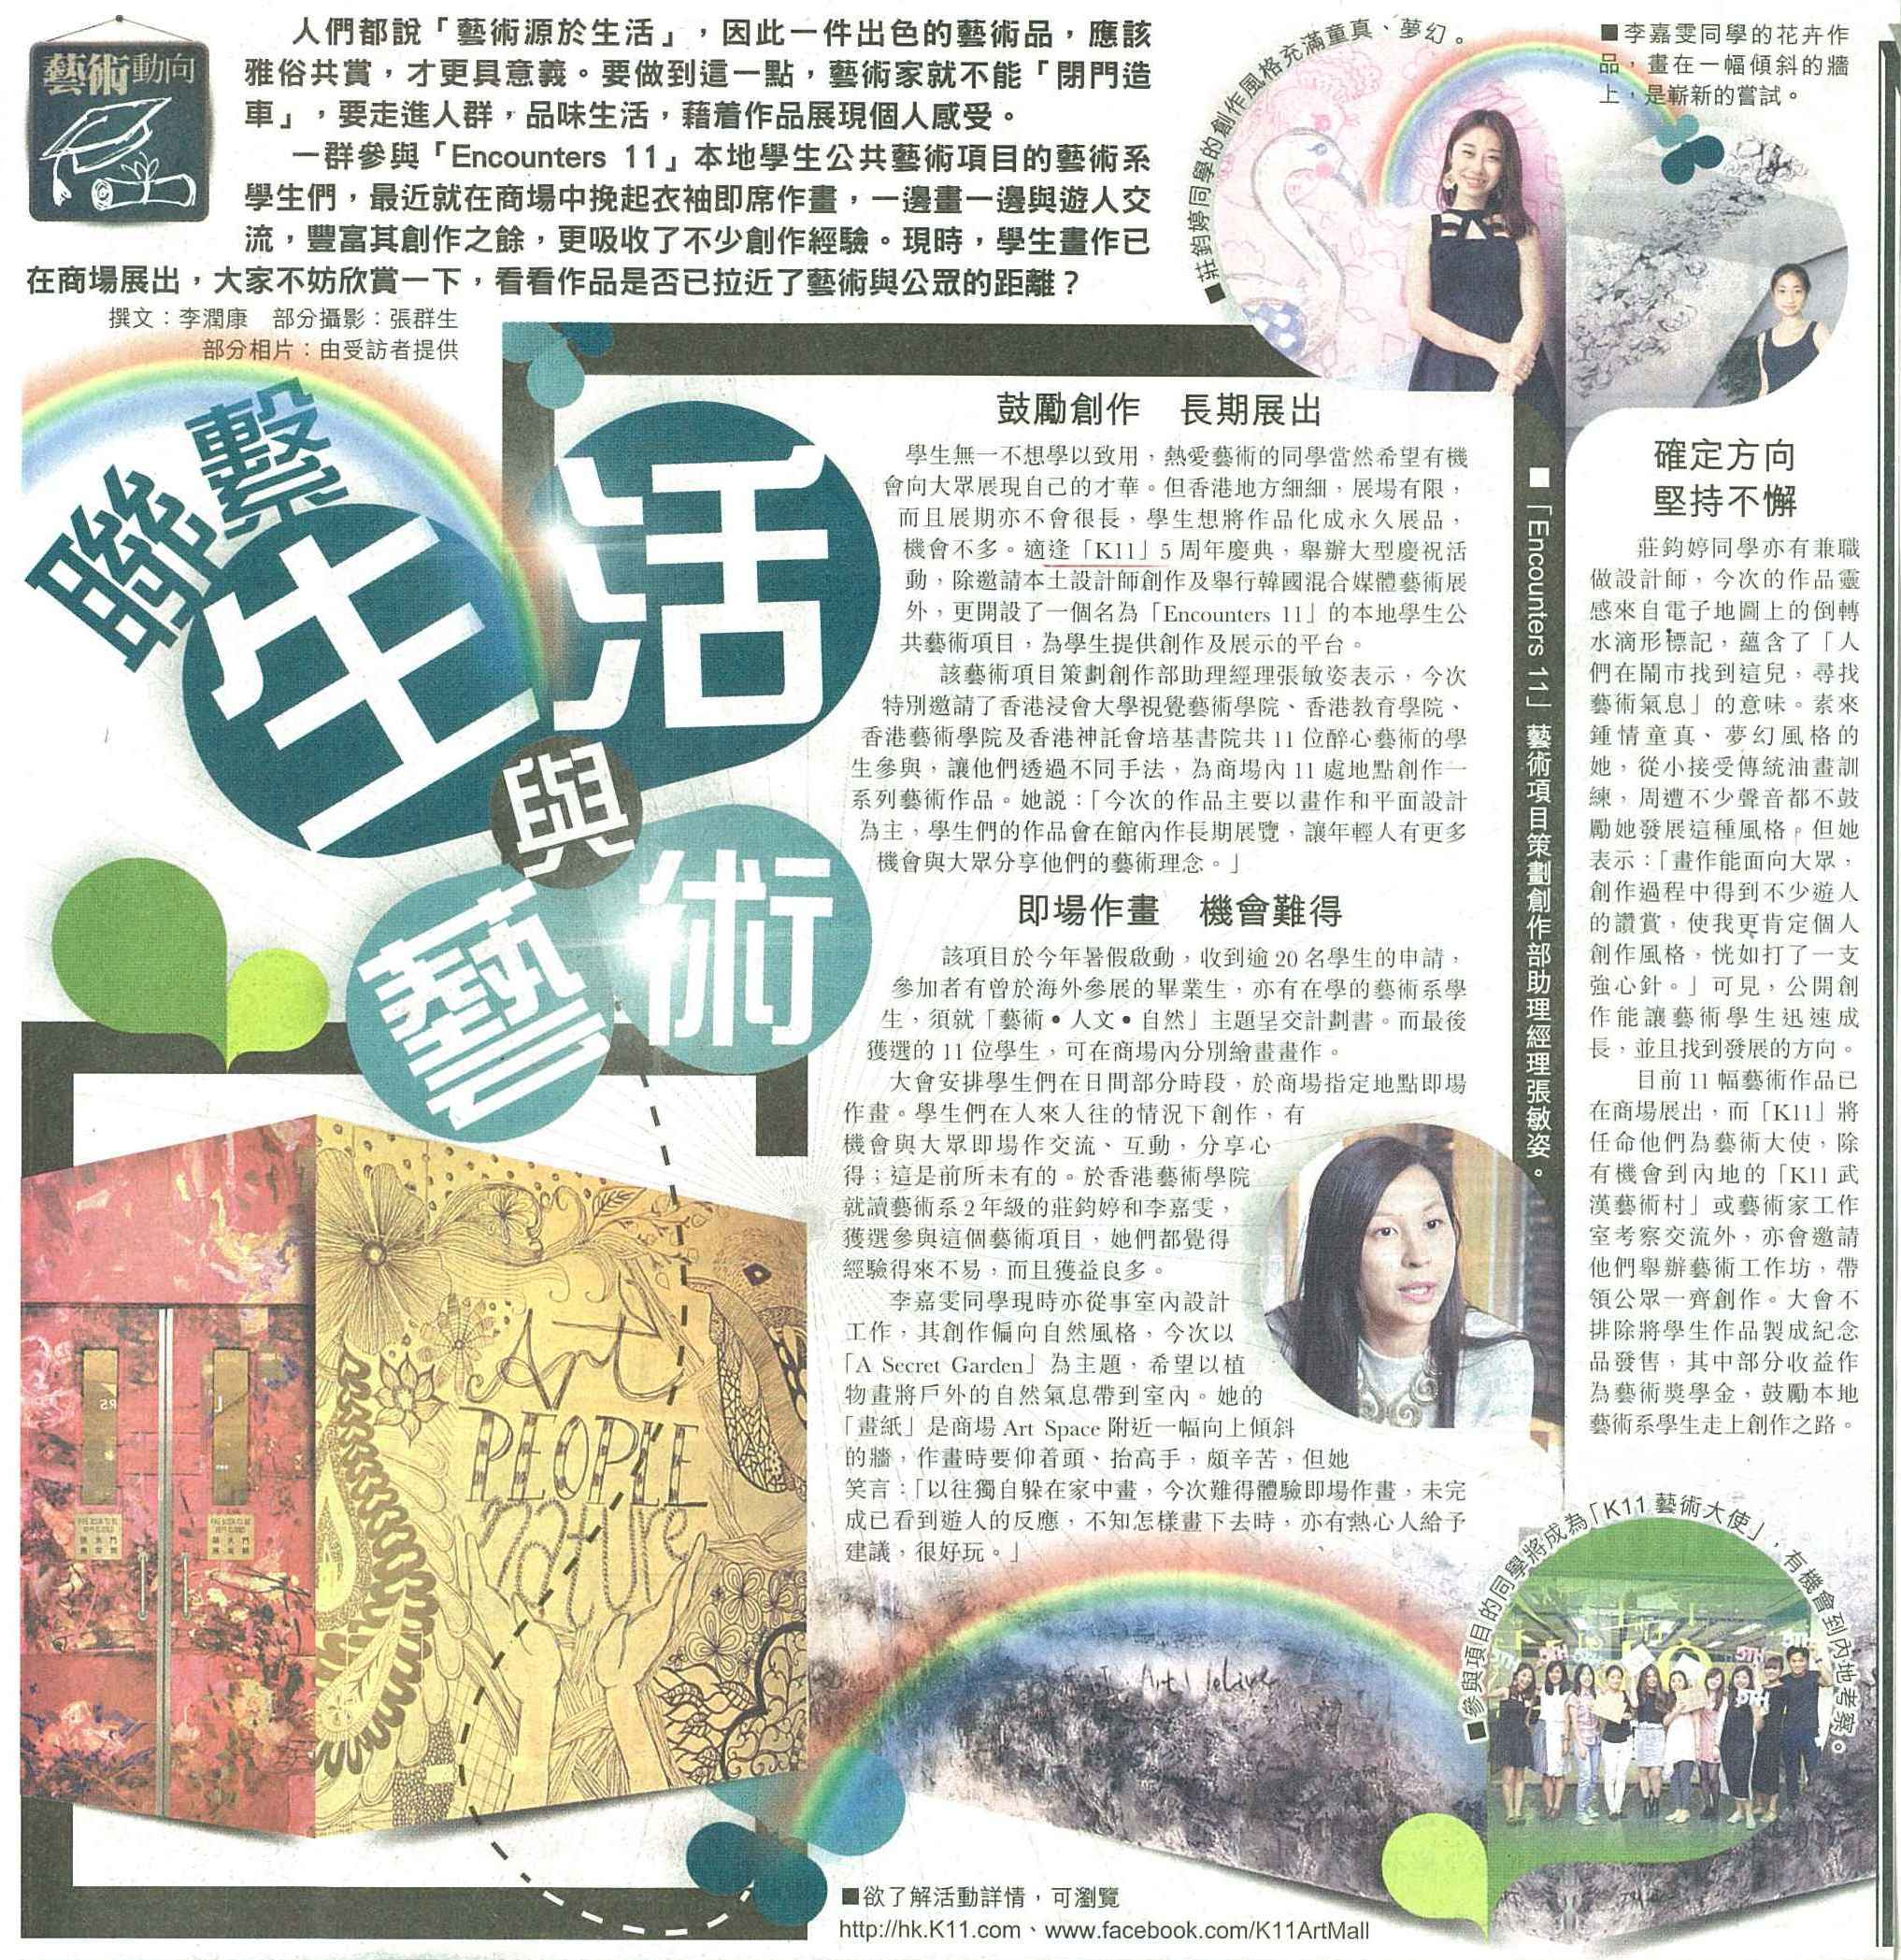 Oriental Daily News 2014